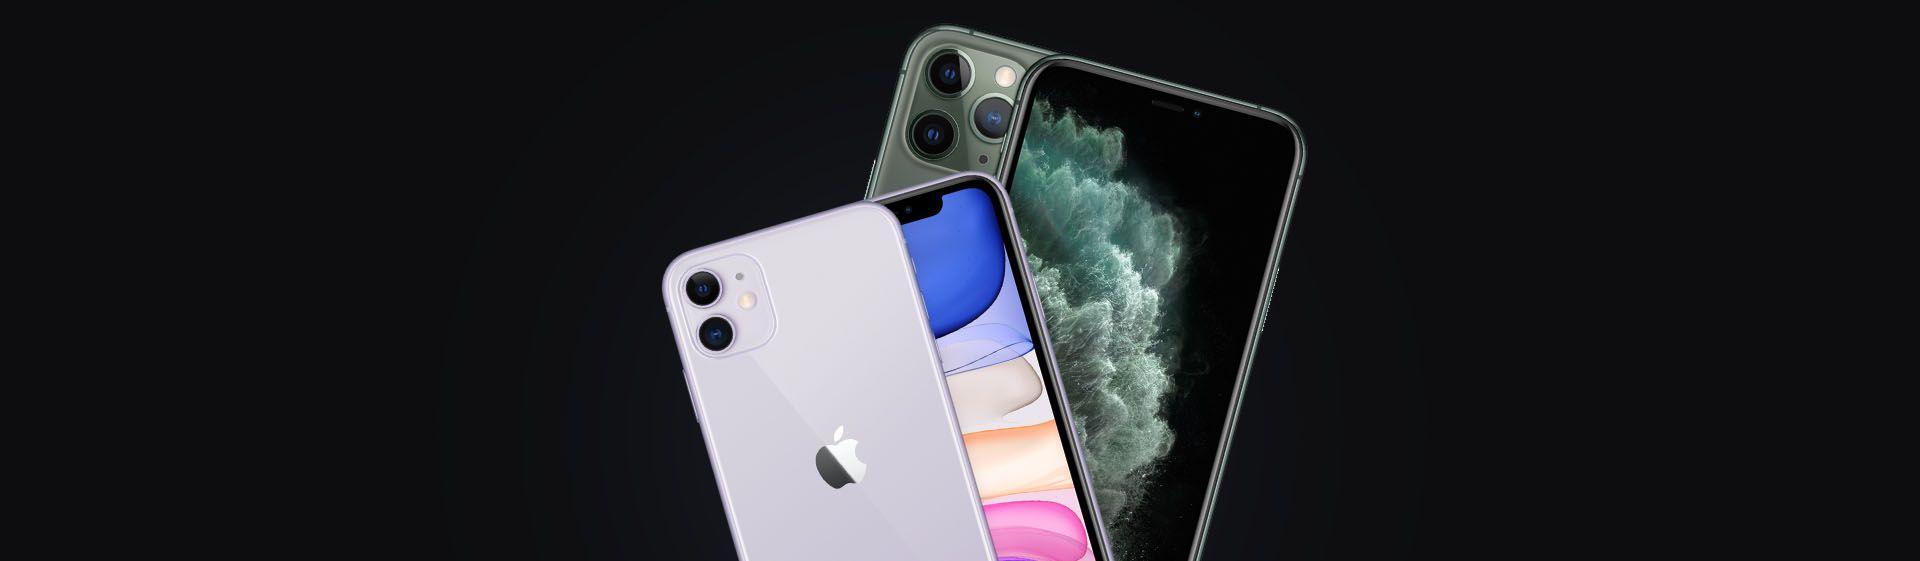 iPhone 11 vs iPhone 11 Pro: conheça 7 diferenças entre os celulares Apple